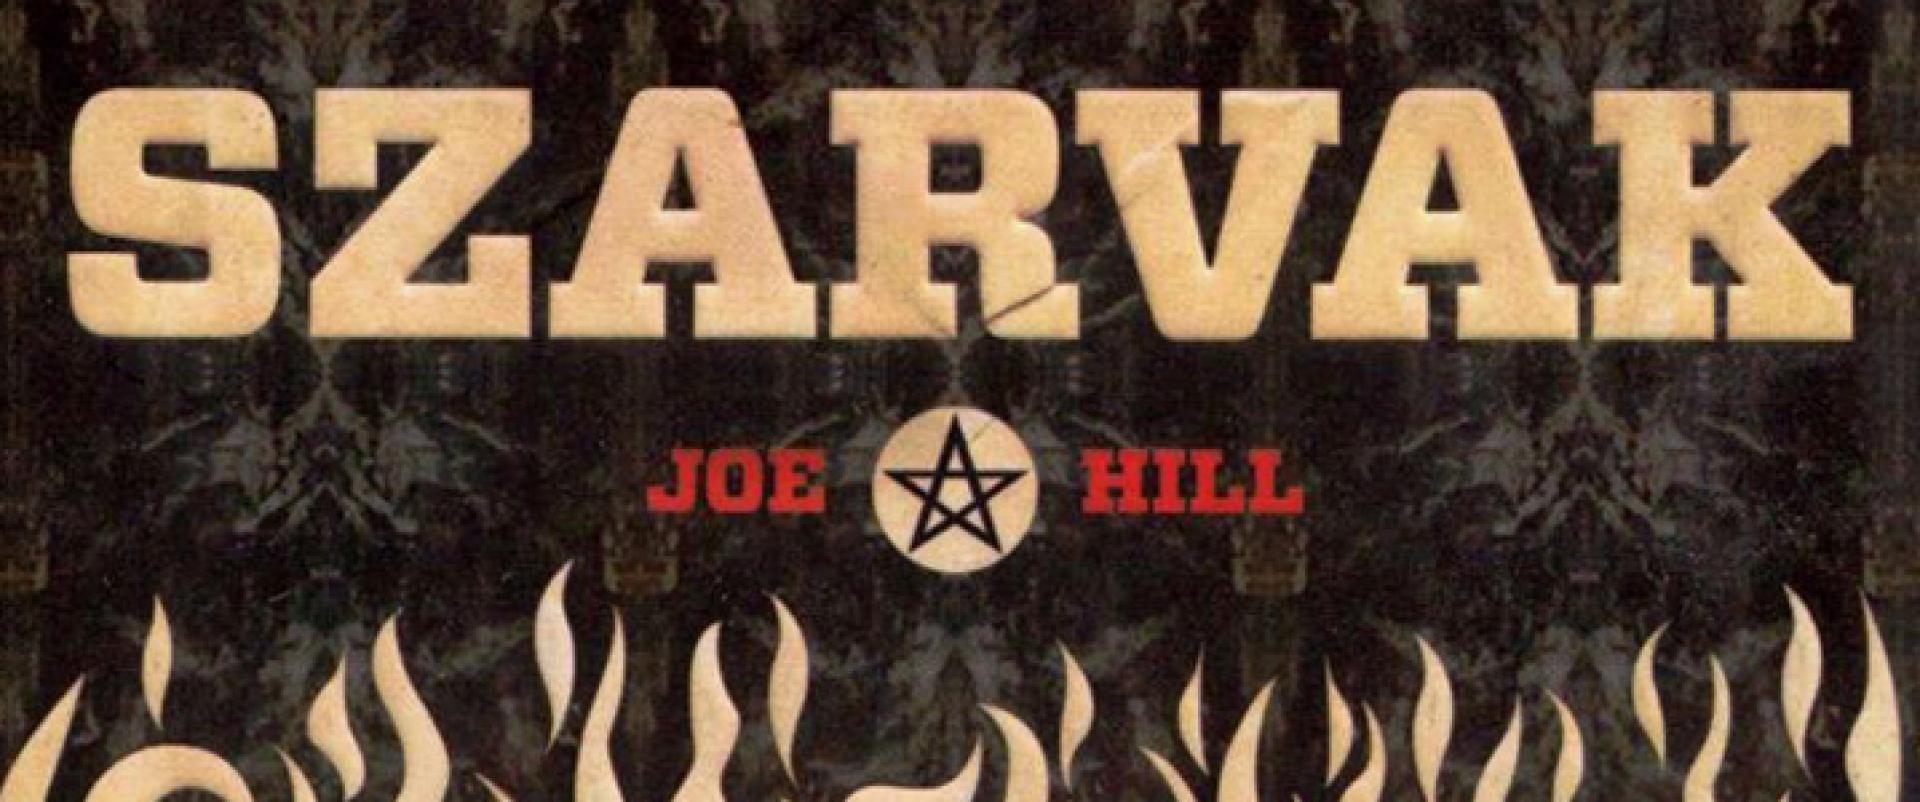 Joe Hill: Horns - Szarvak (2012)